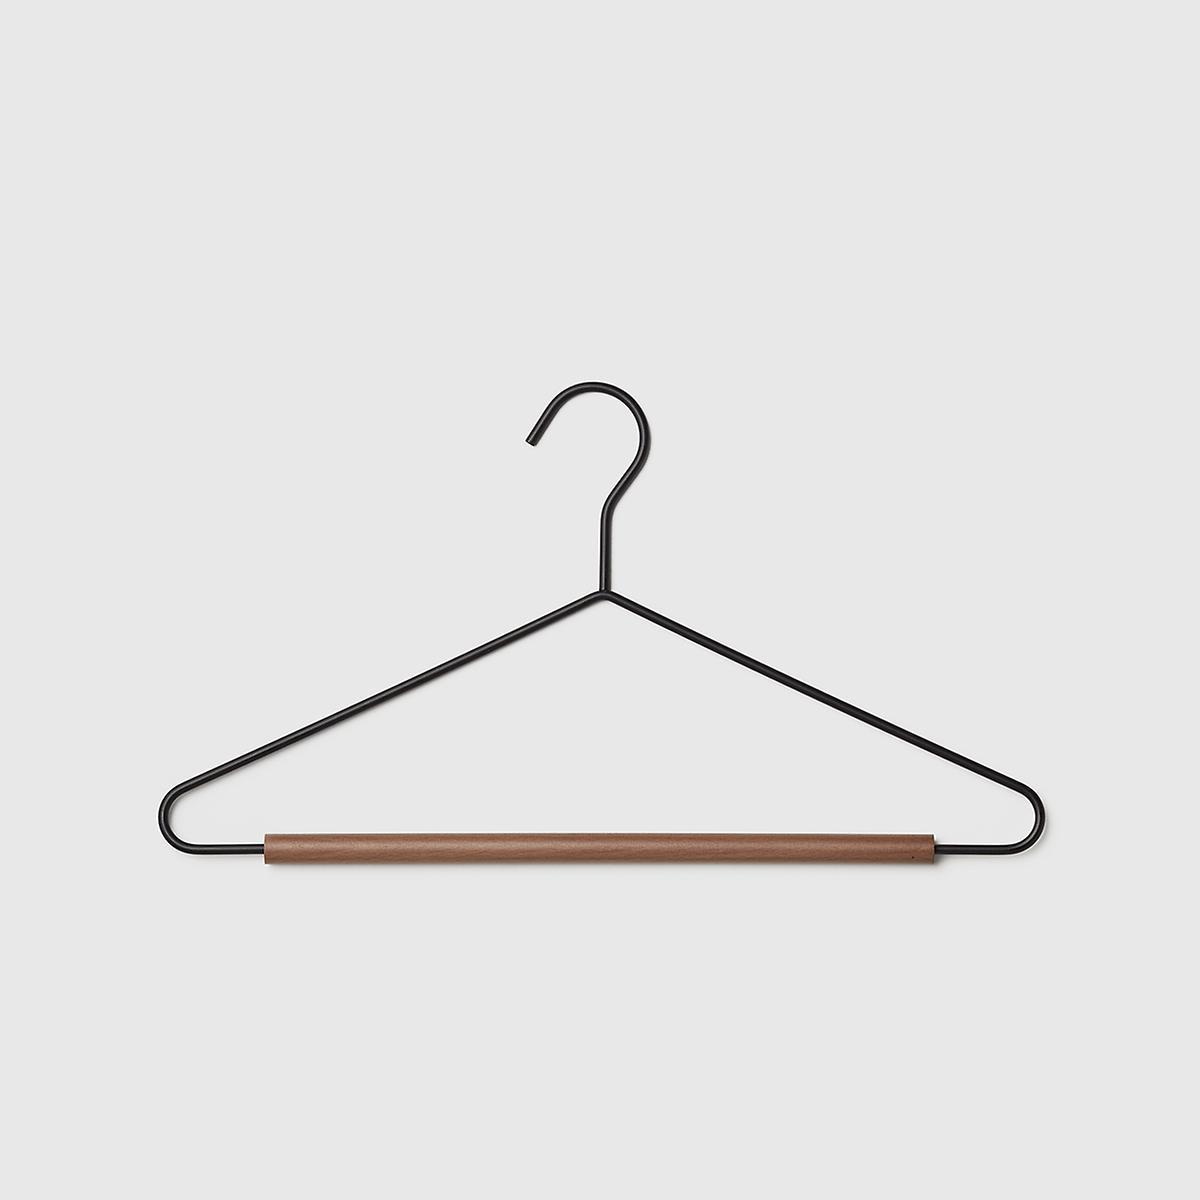 Marie Kondo Ink Black Serene Matte Metal Suit Hanger